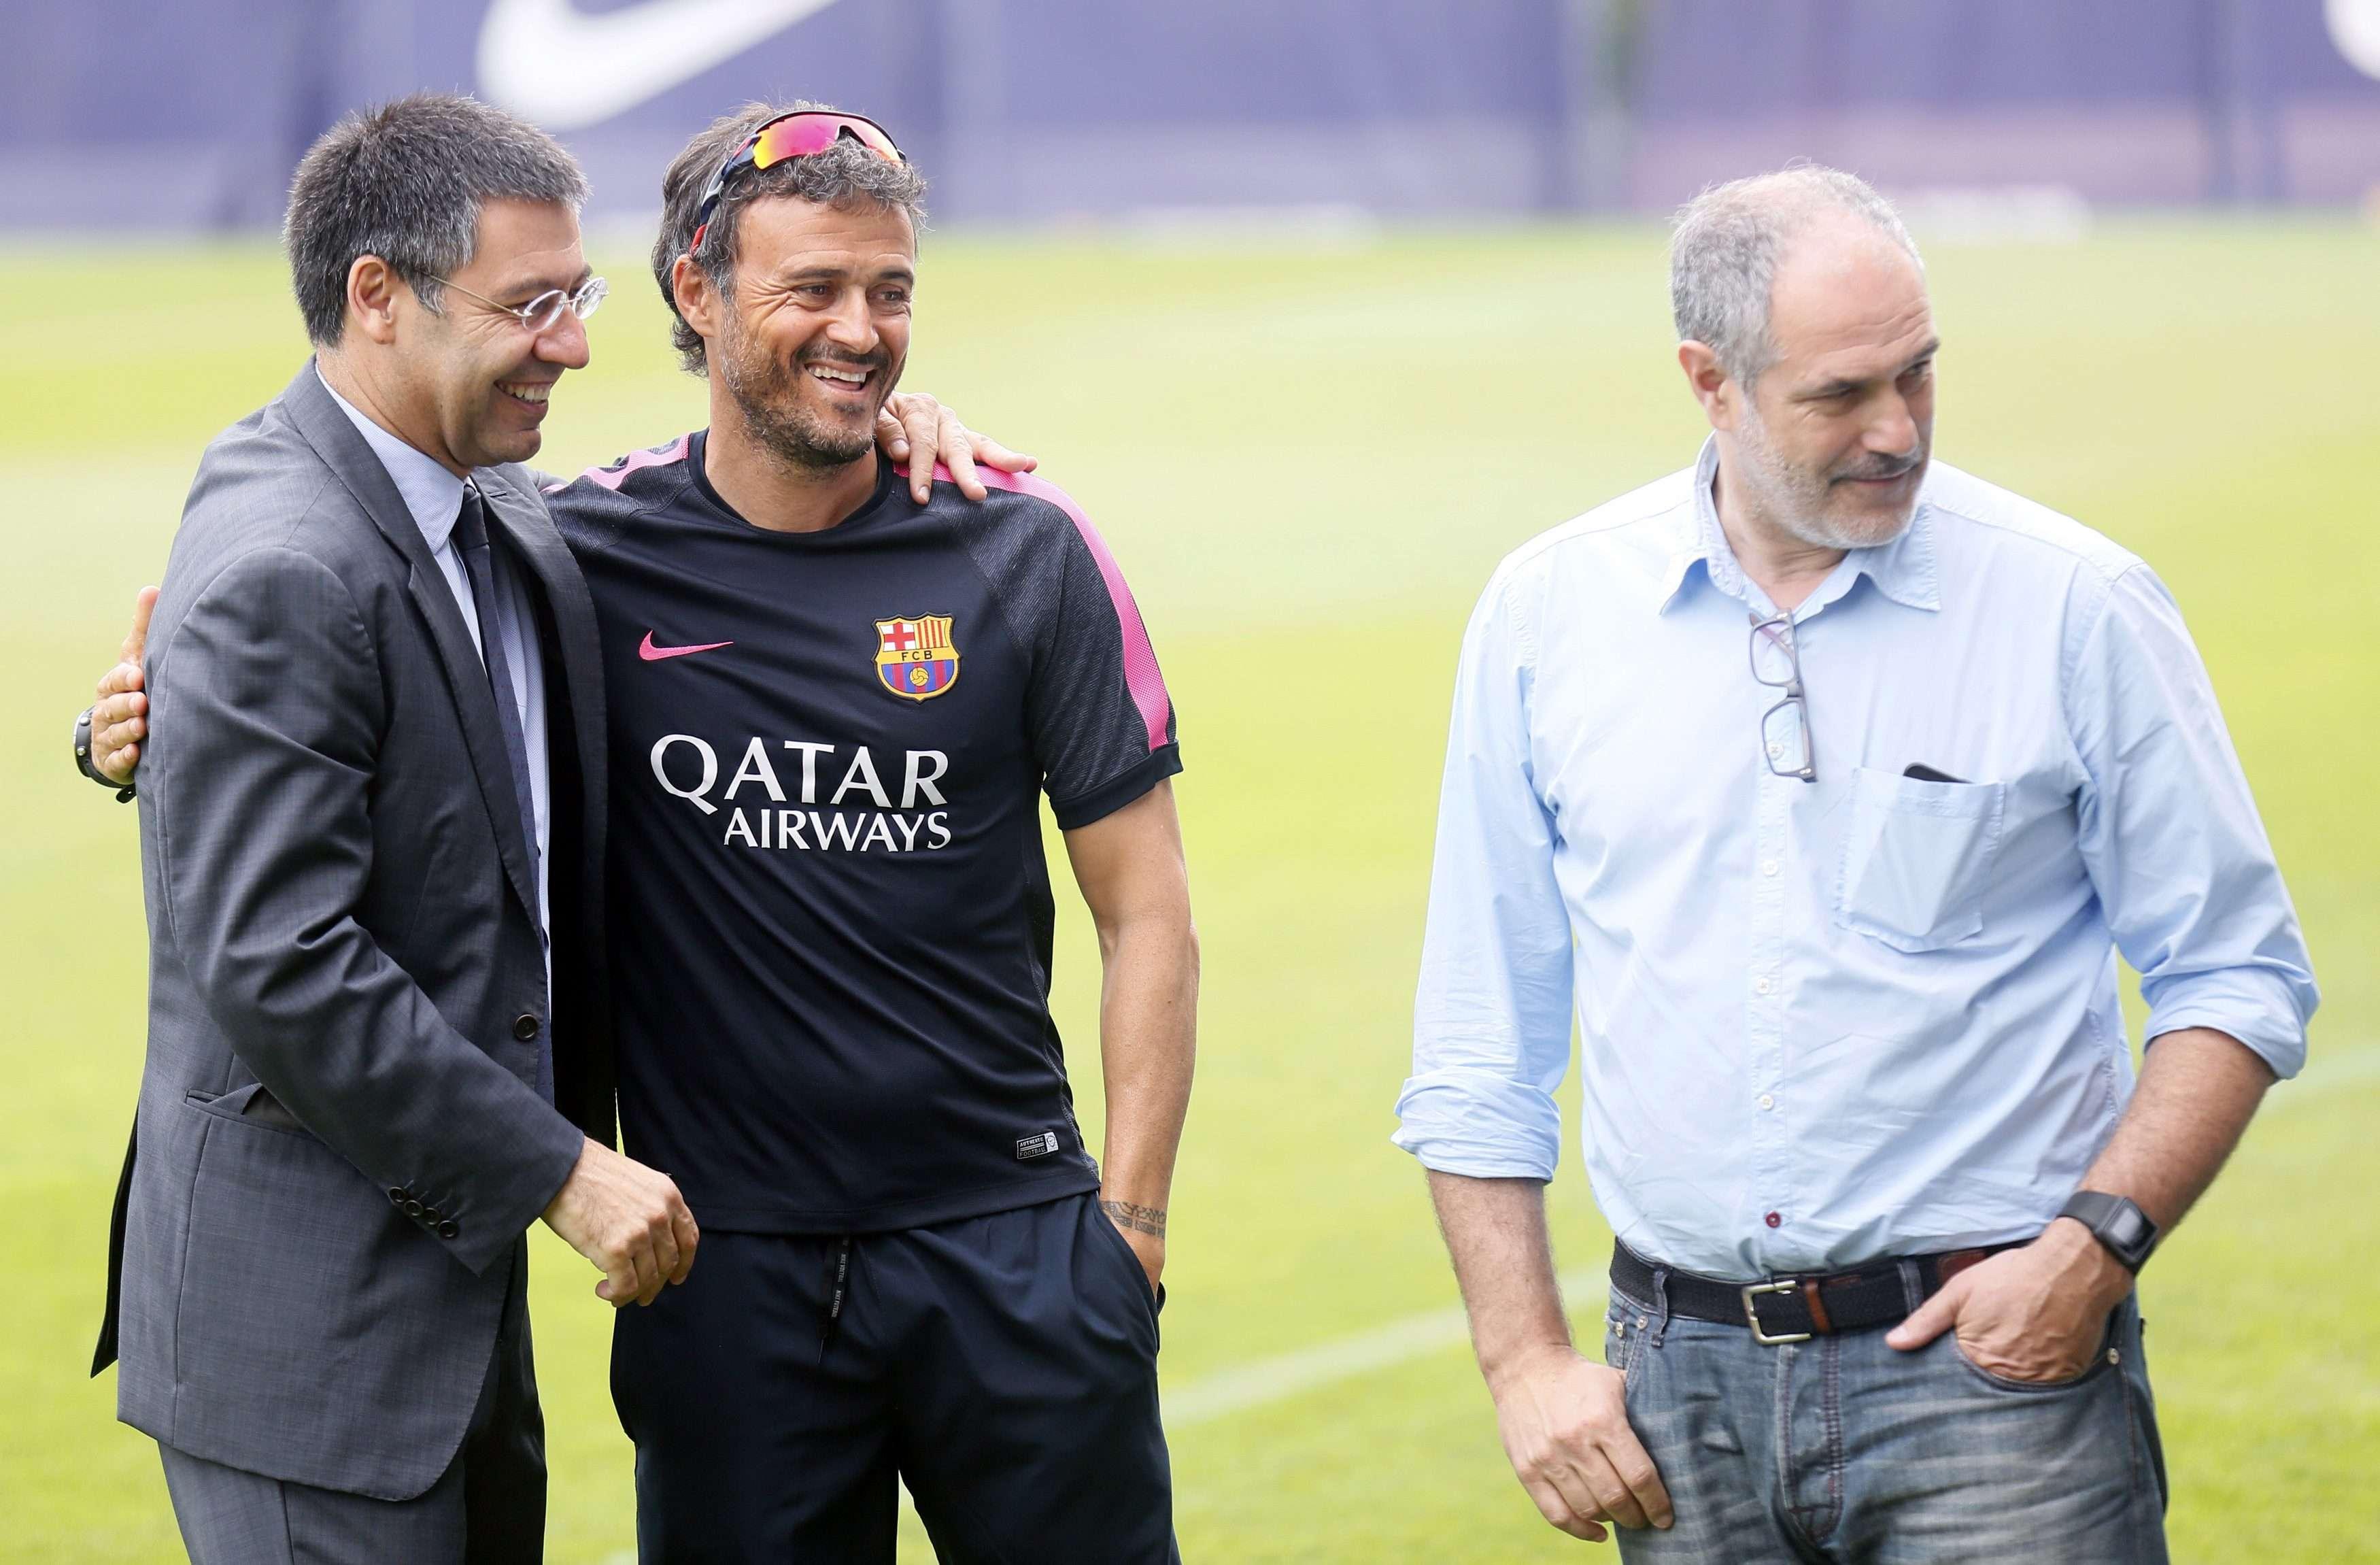 La FIFA prohíbe al Barça fichar hasta enero de 2016